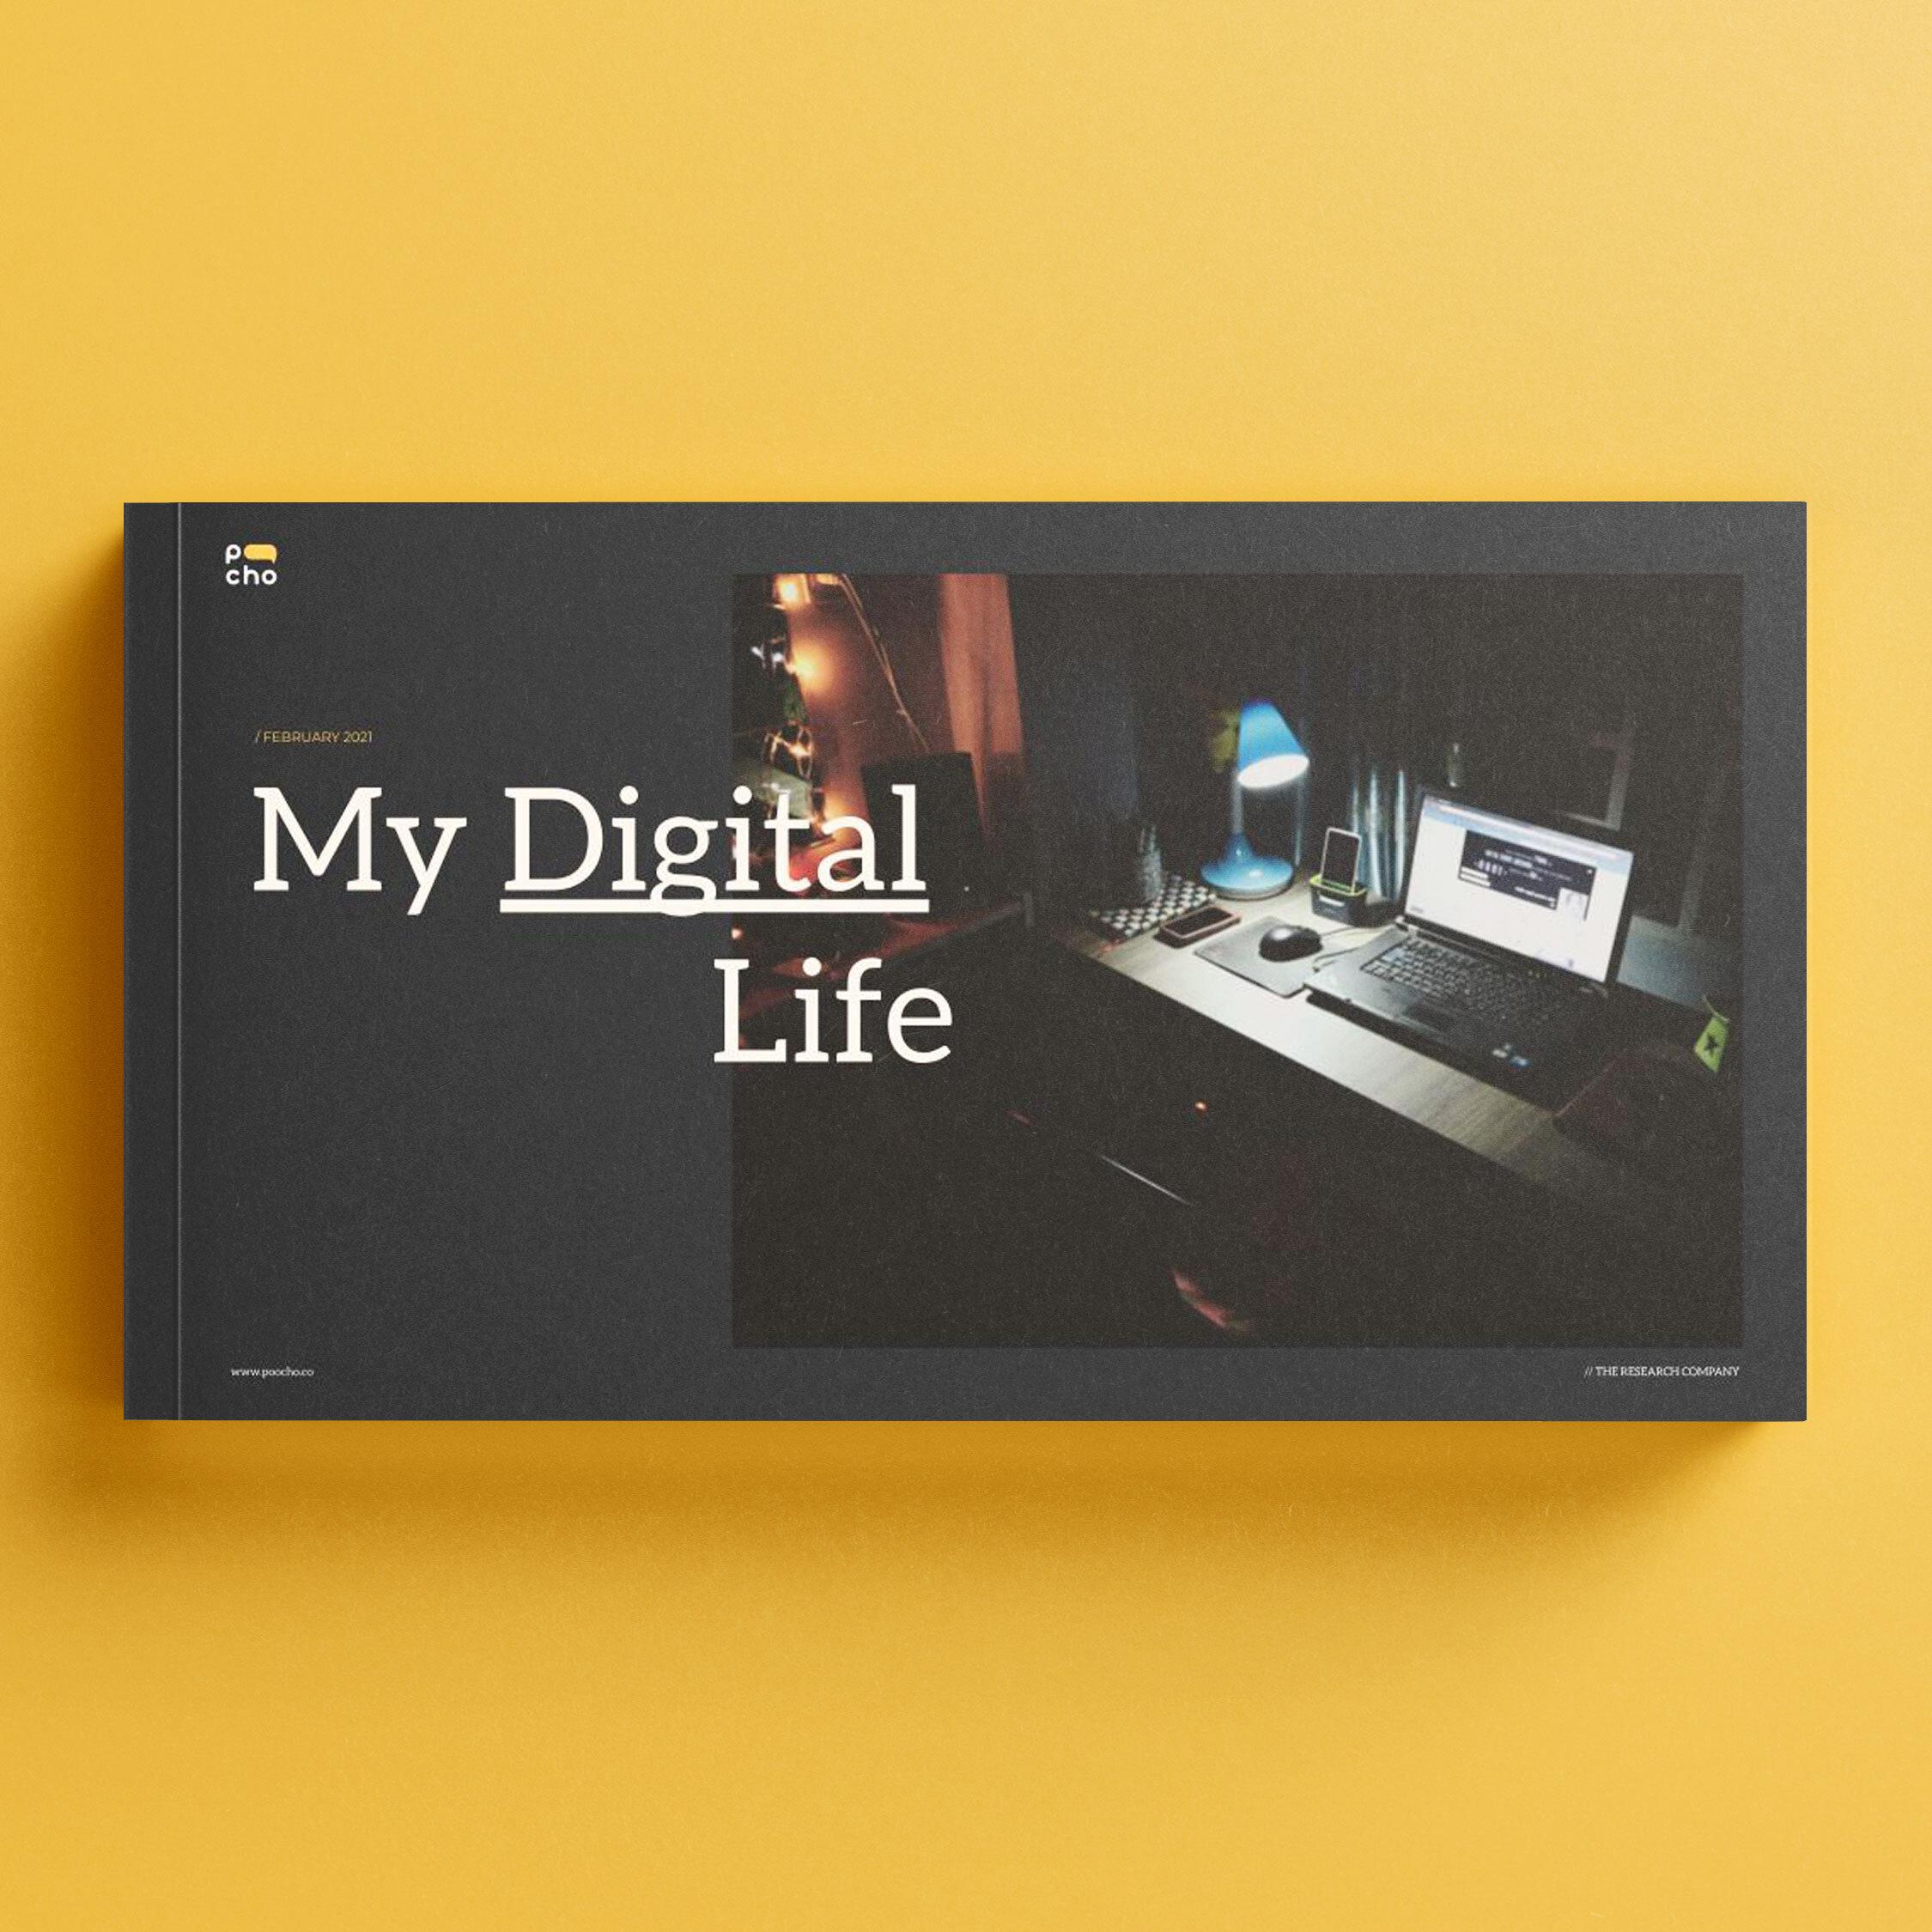 My Digital Life